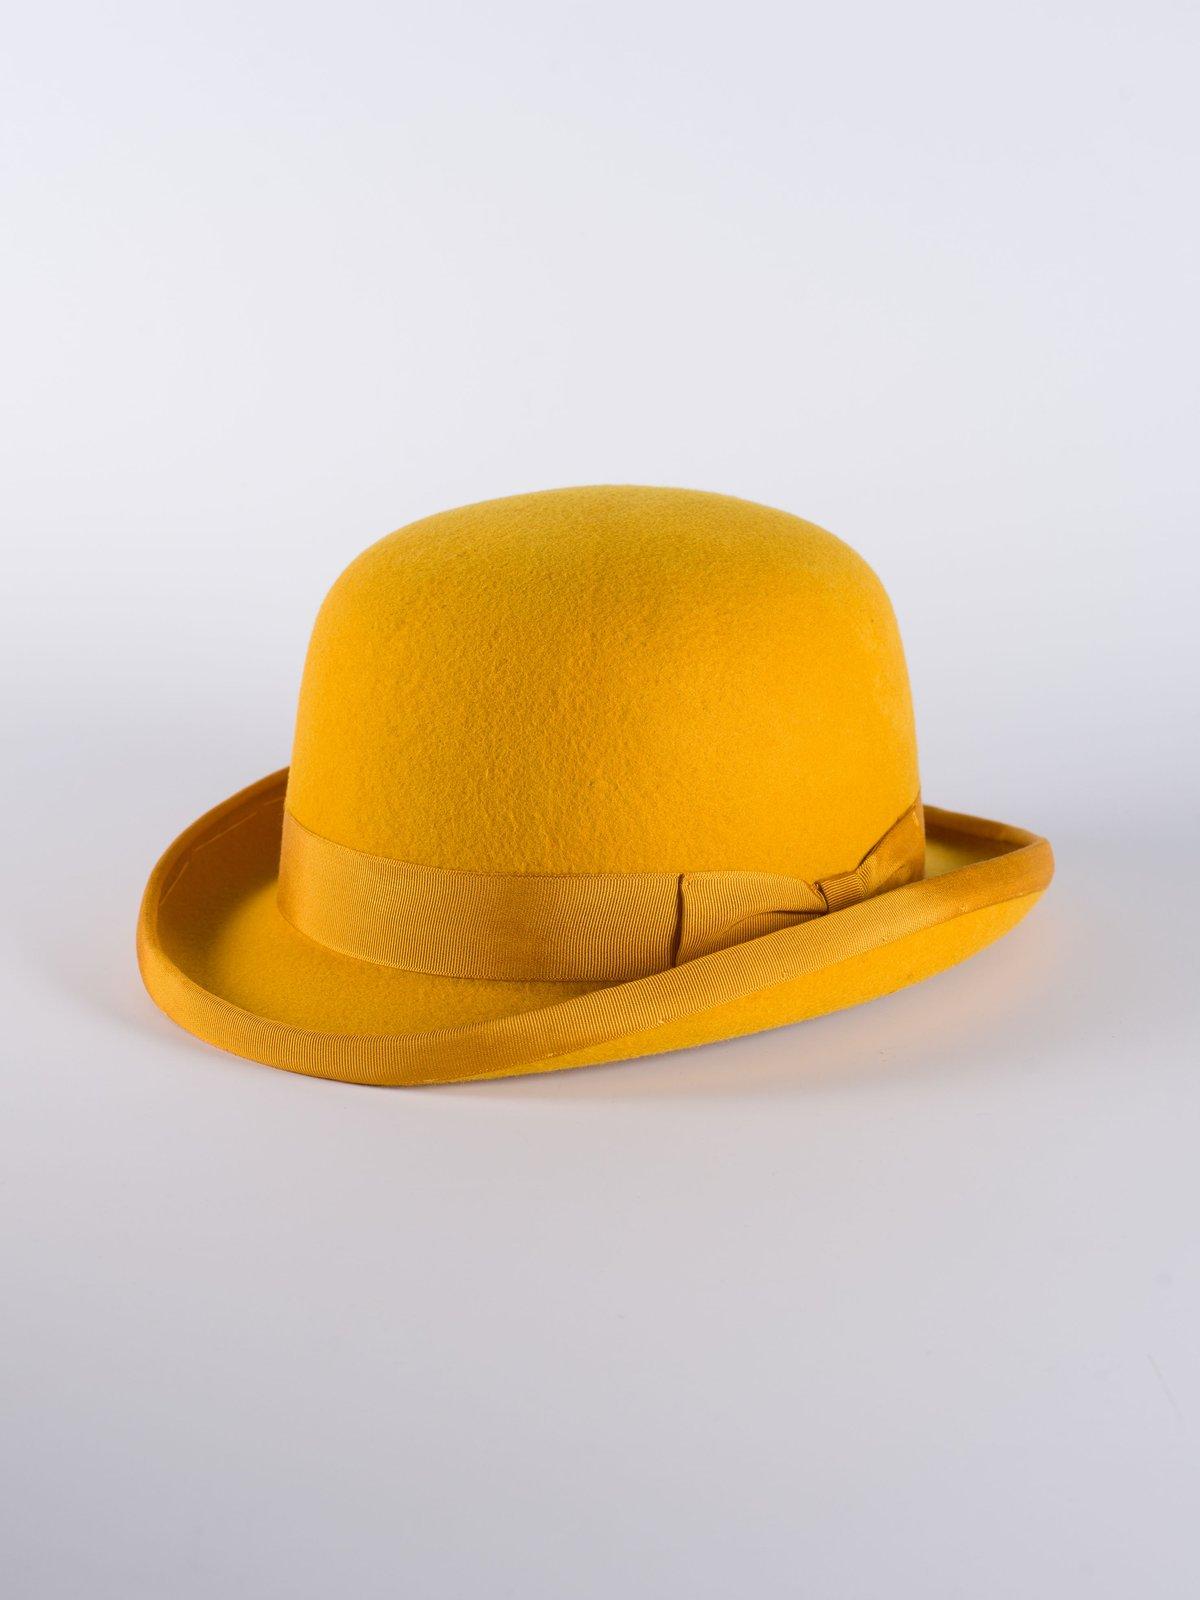 Mustard Bowler Hat  19495718dce